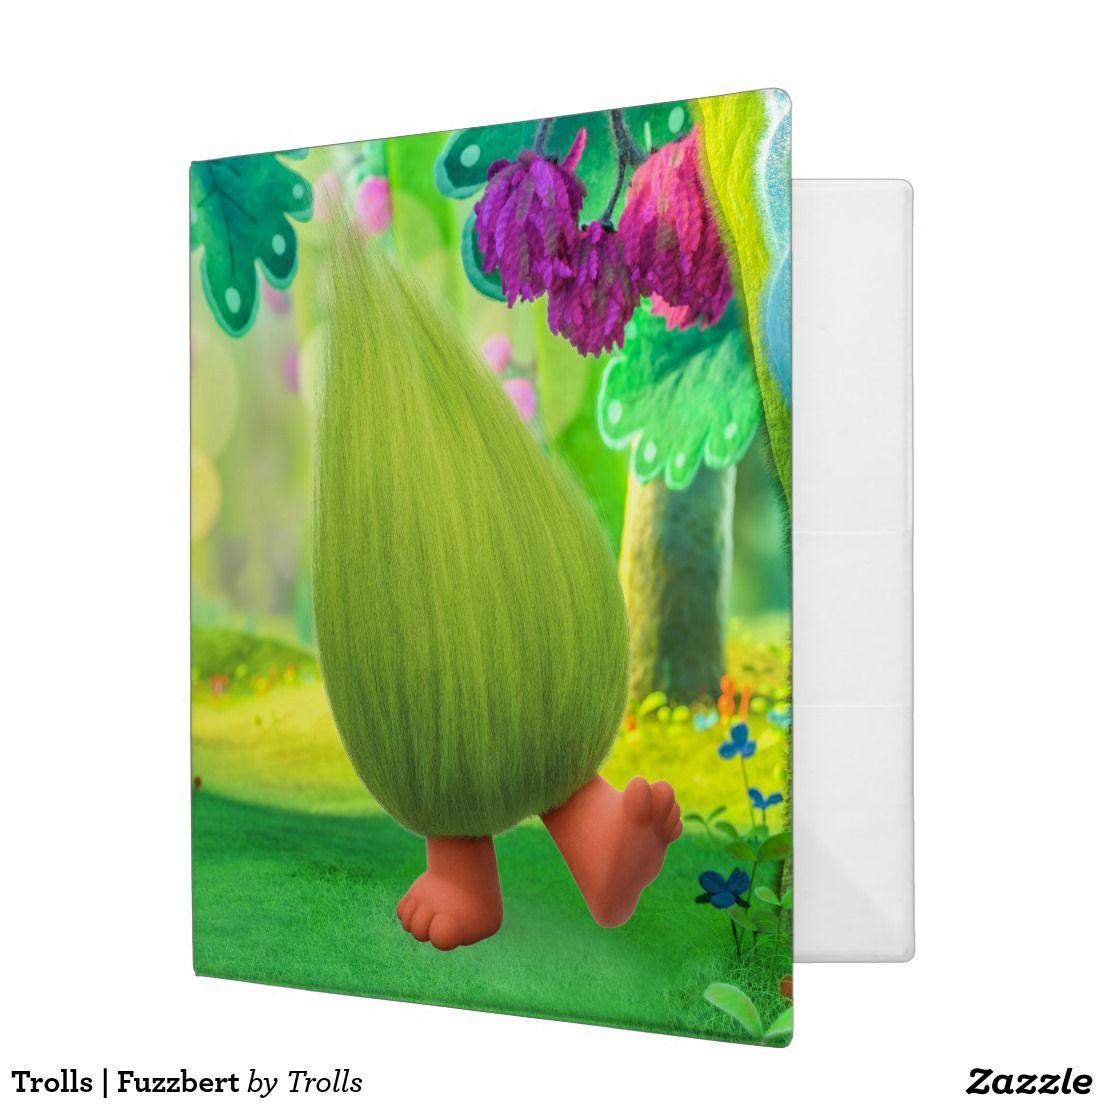 Trolls coloring pages fuzzbert - Trolls Fuzzbert Binder